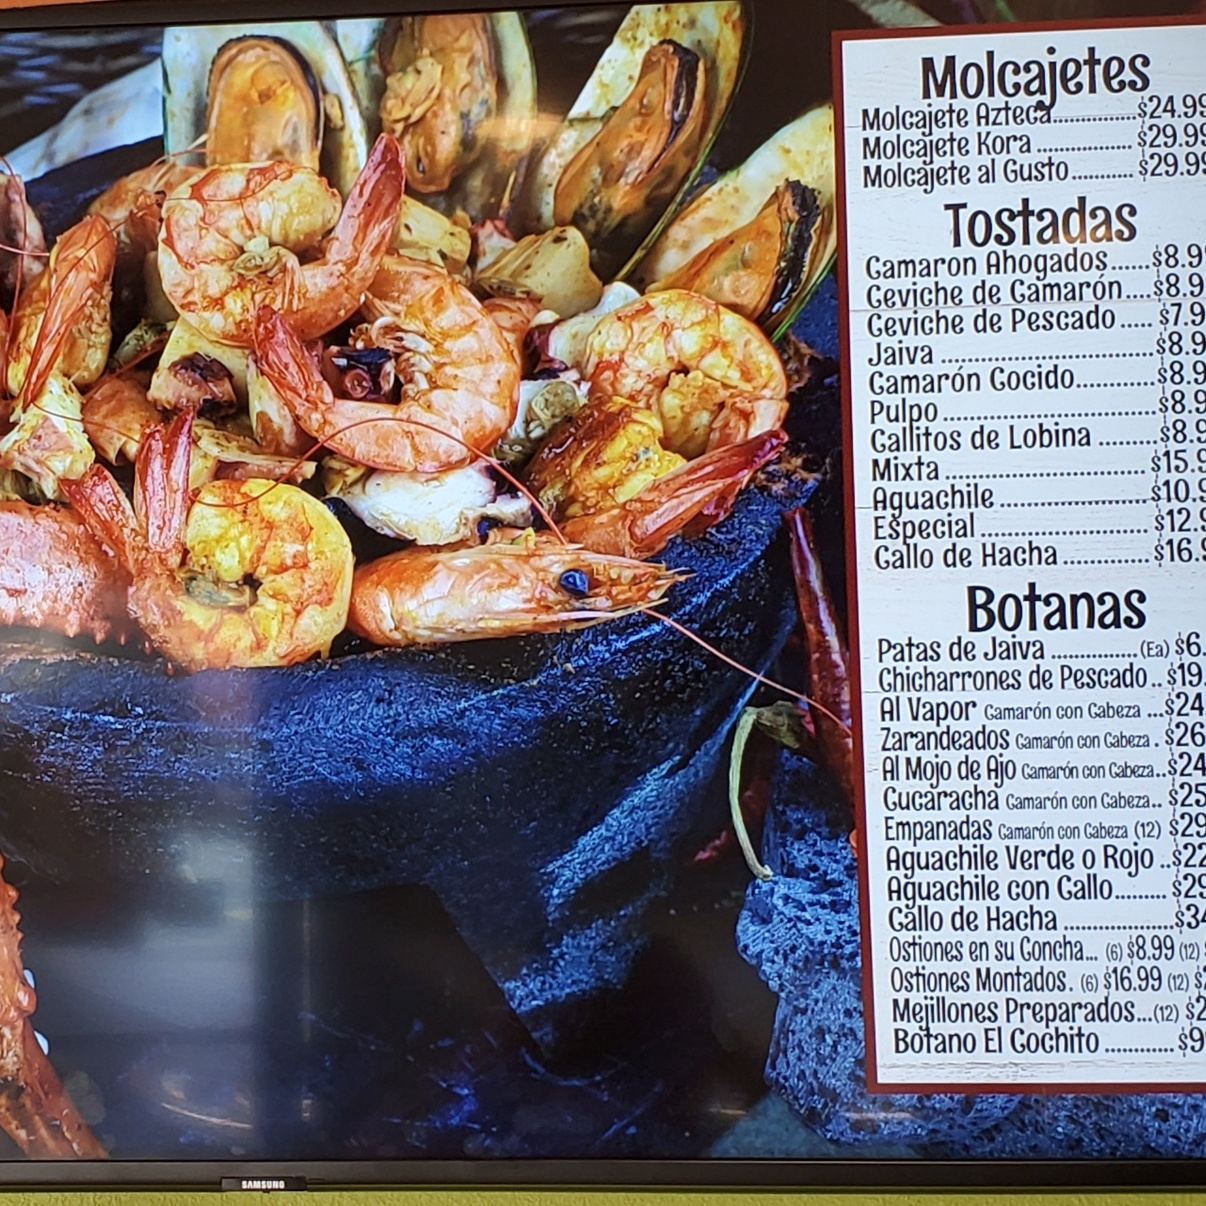 El Cochito Sinaloense image 21